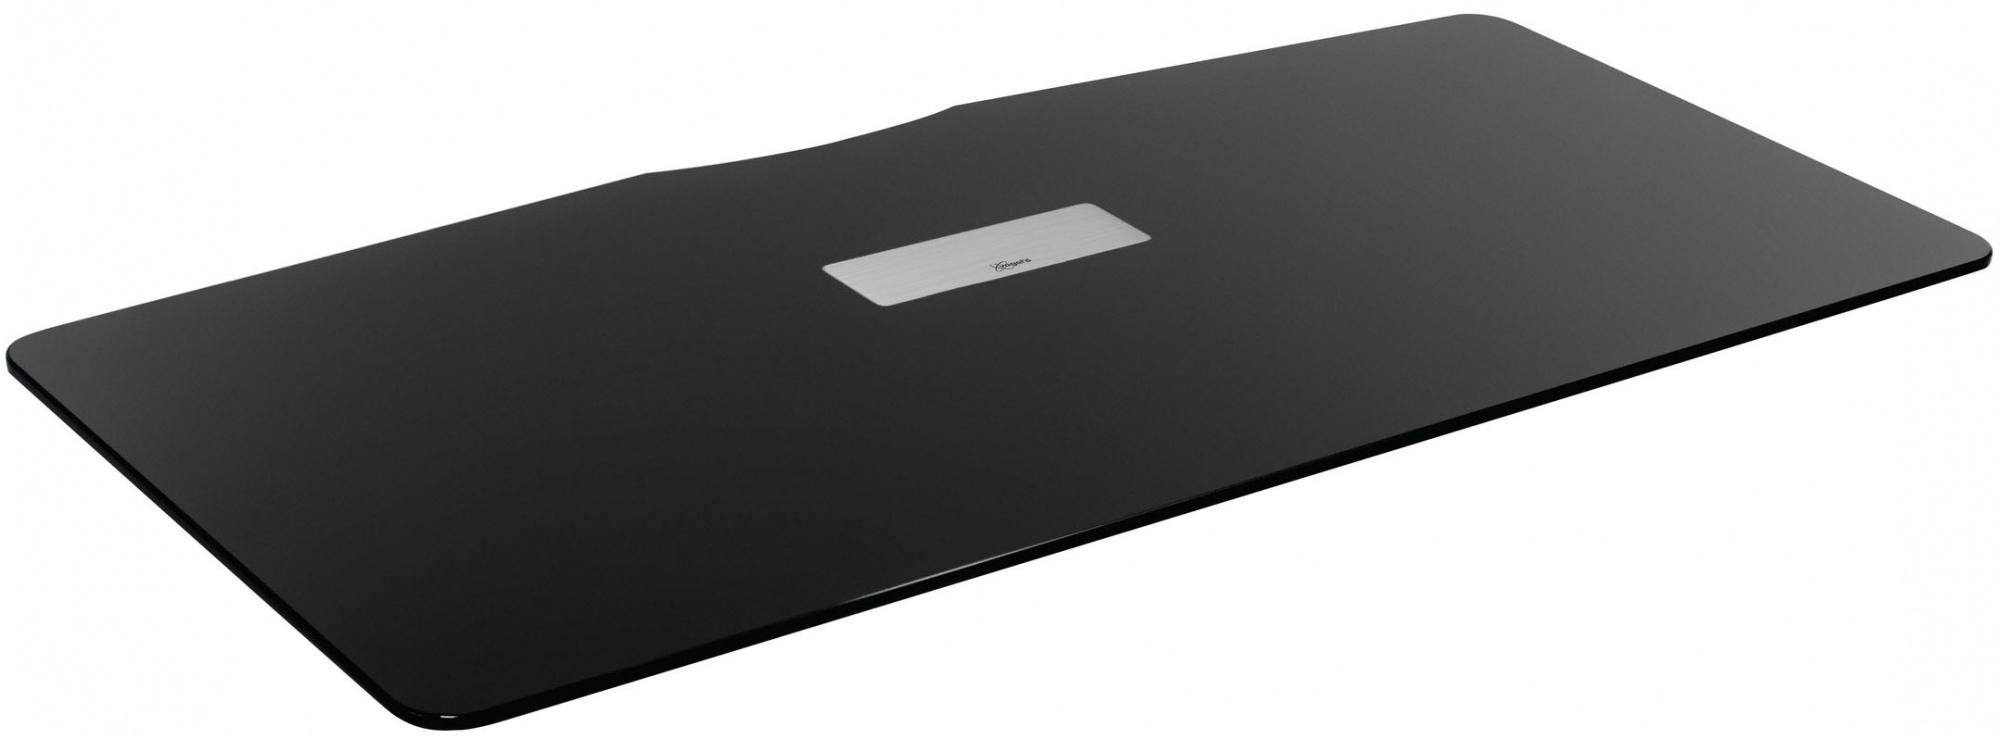 Vogel's NEXT 7825 - полка для аудио-видео аппаратуры (Black)